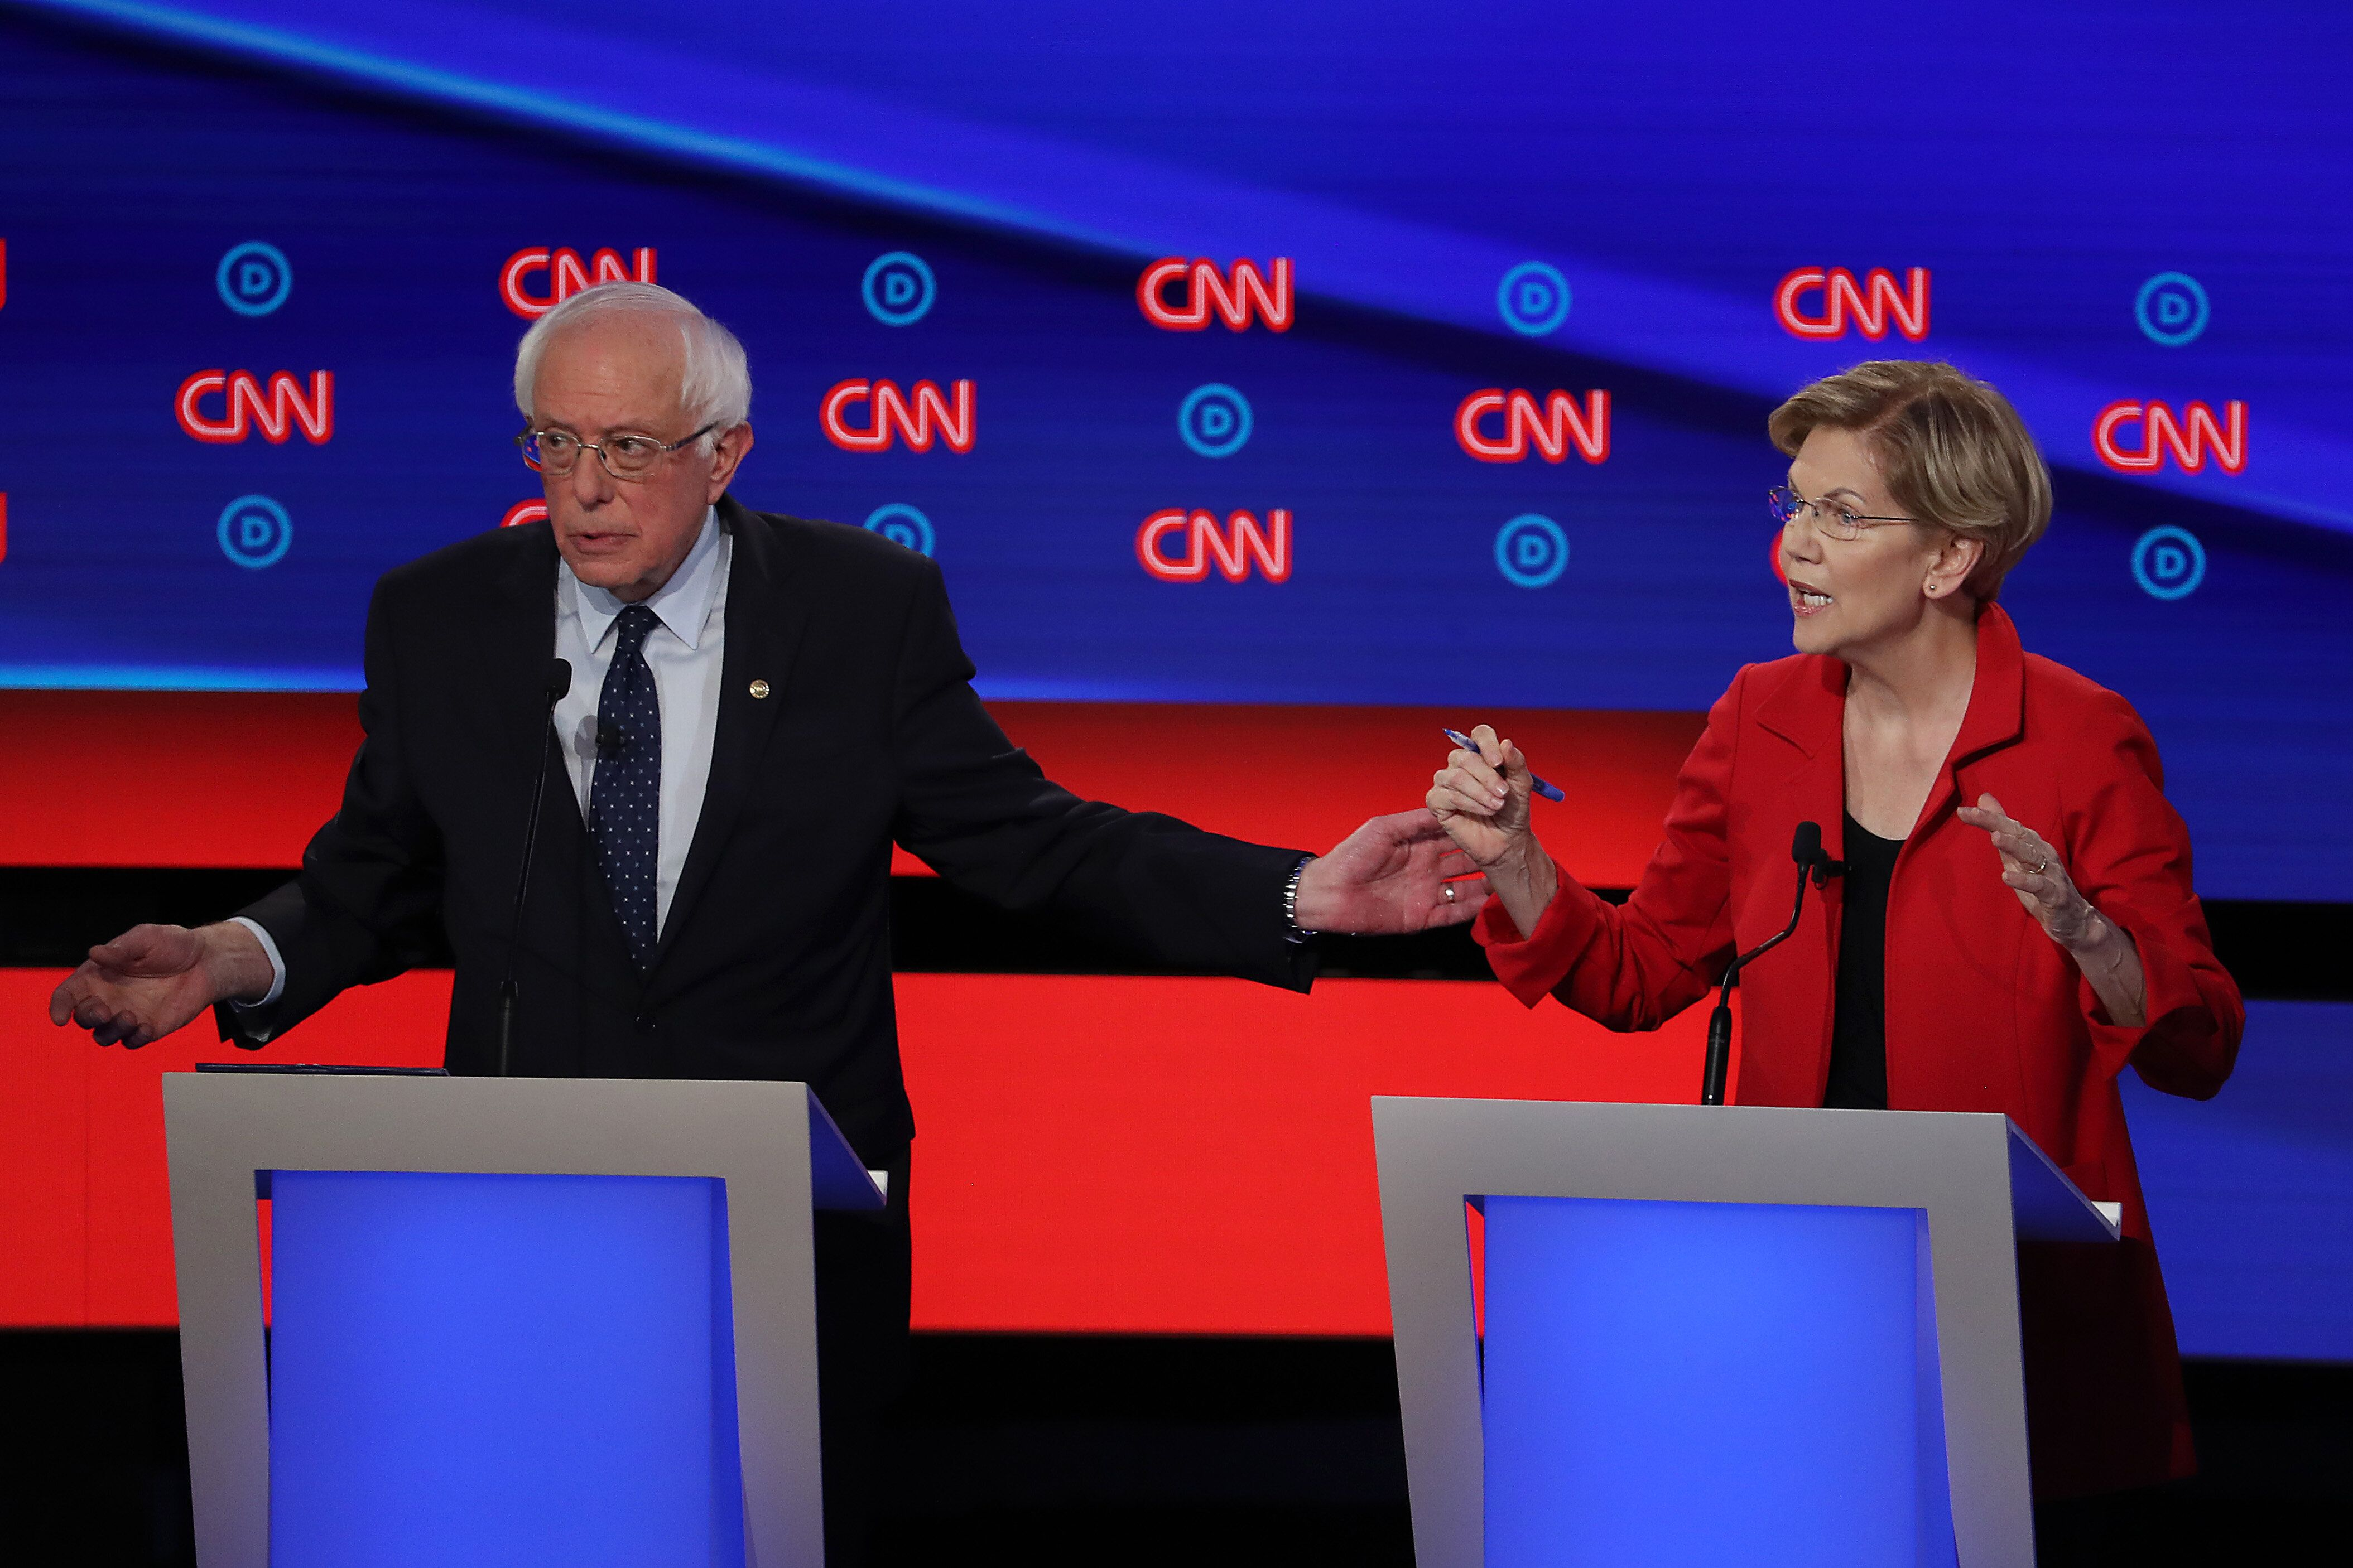 Sens. Bernie Sanders (I-Vt.) and Elizabeth Warren (D-Mass.) made similar arguments about health care during the Democratic pr